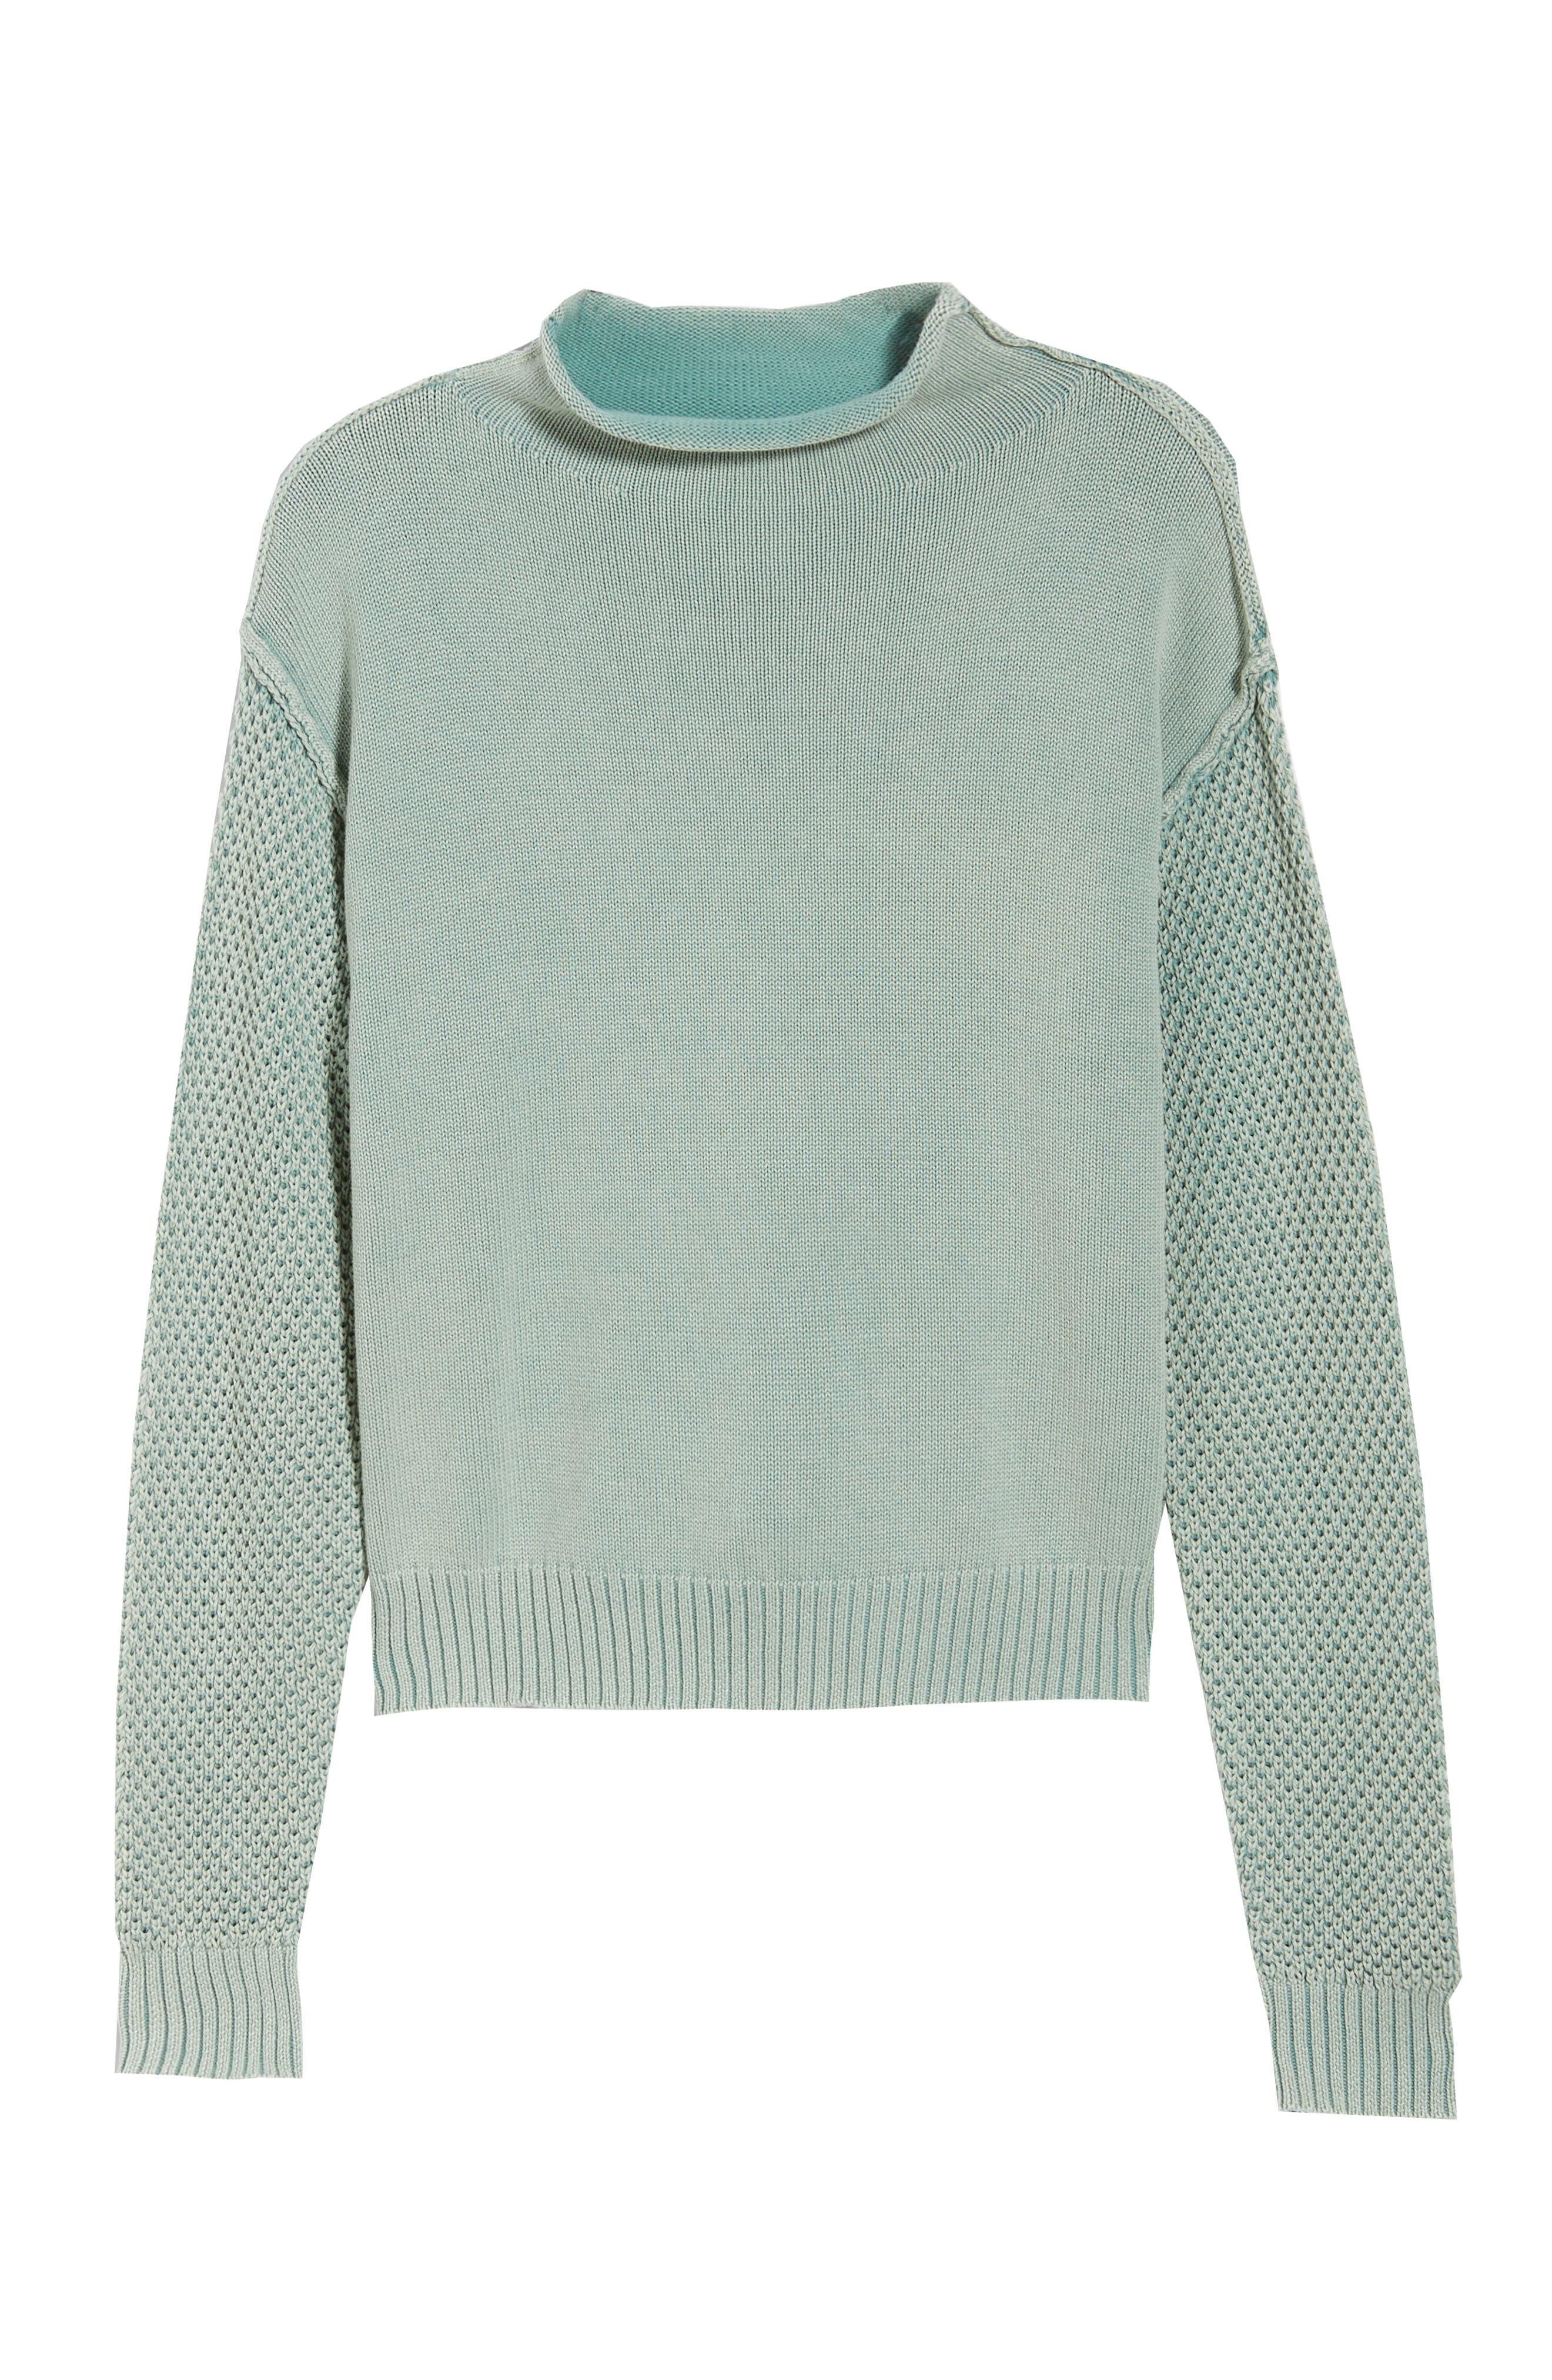 Exposed Seam Sweater,                             Alternate thumbnail 6, color,                             SEA WASH